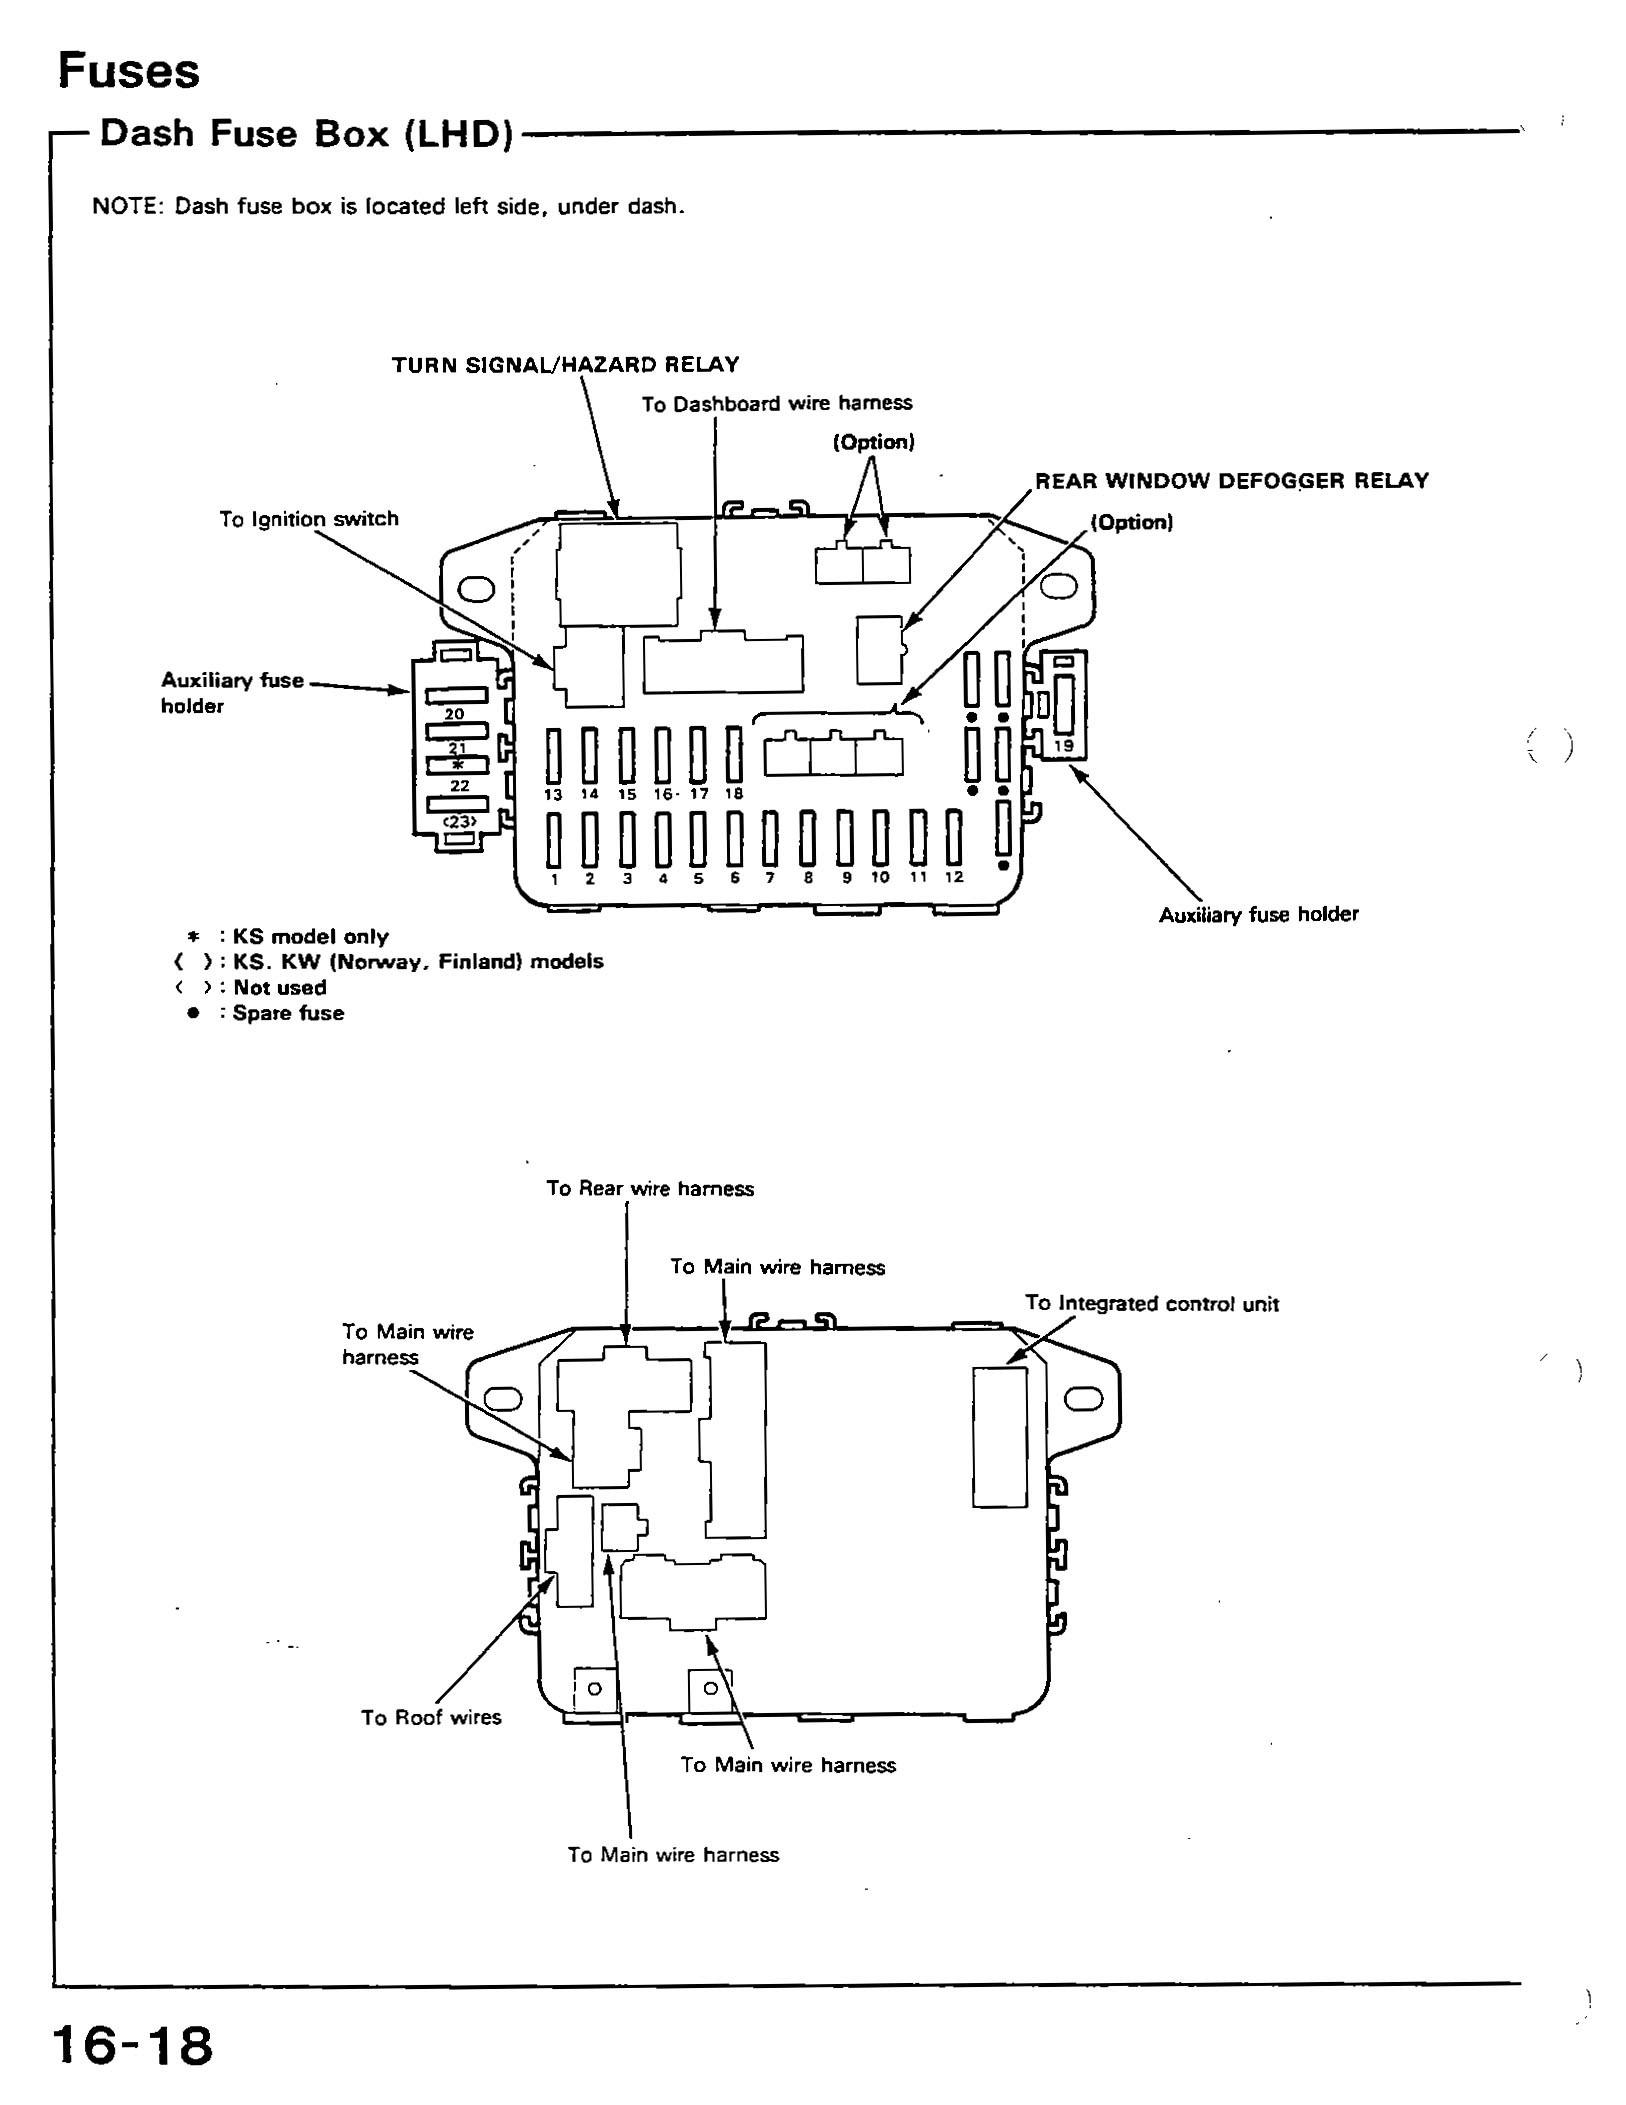 91 Honda Accord Engine Diagram 91 Civic Si Fuse Diagram Honda Tech Honda forum Discussion Of 91 Honda Accord Engine Diagram